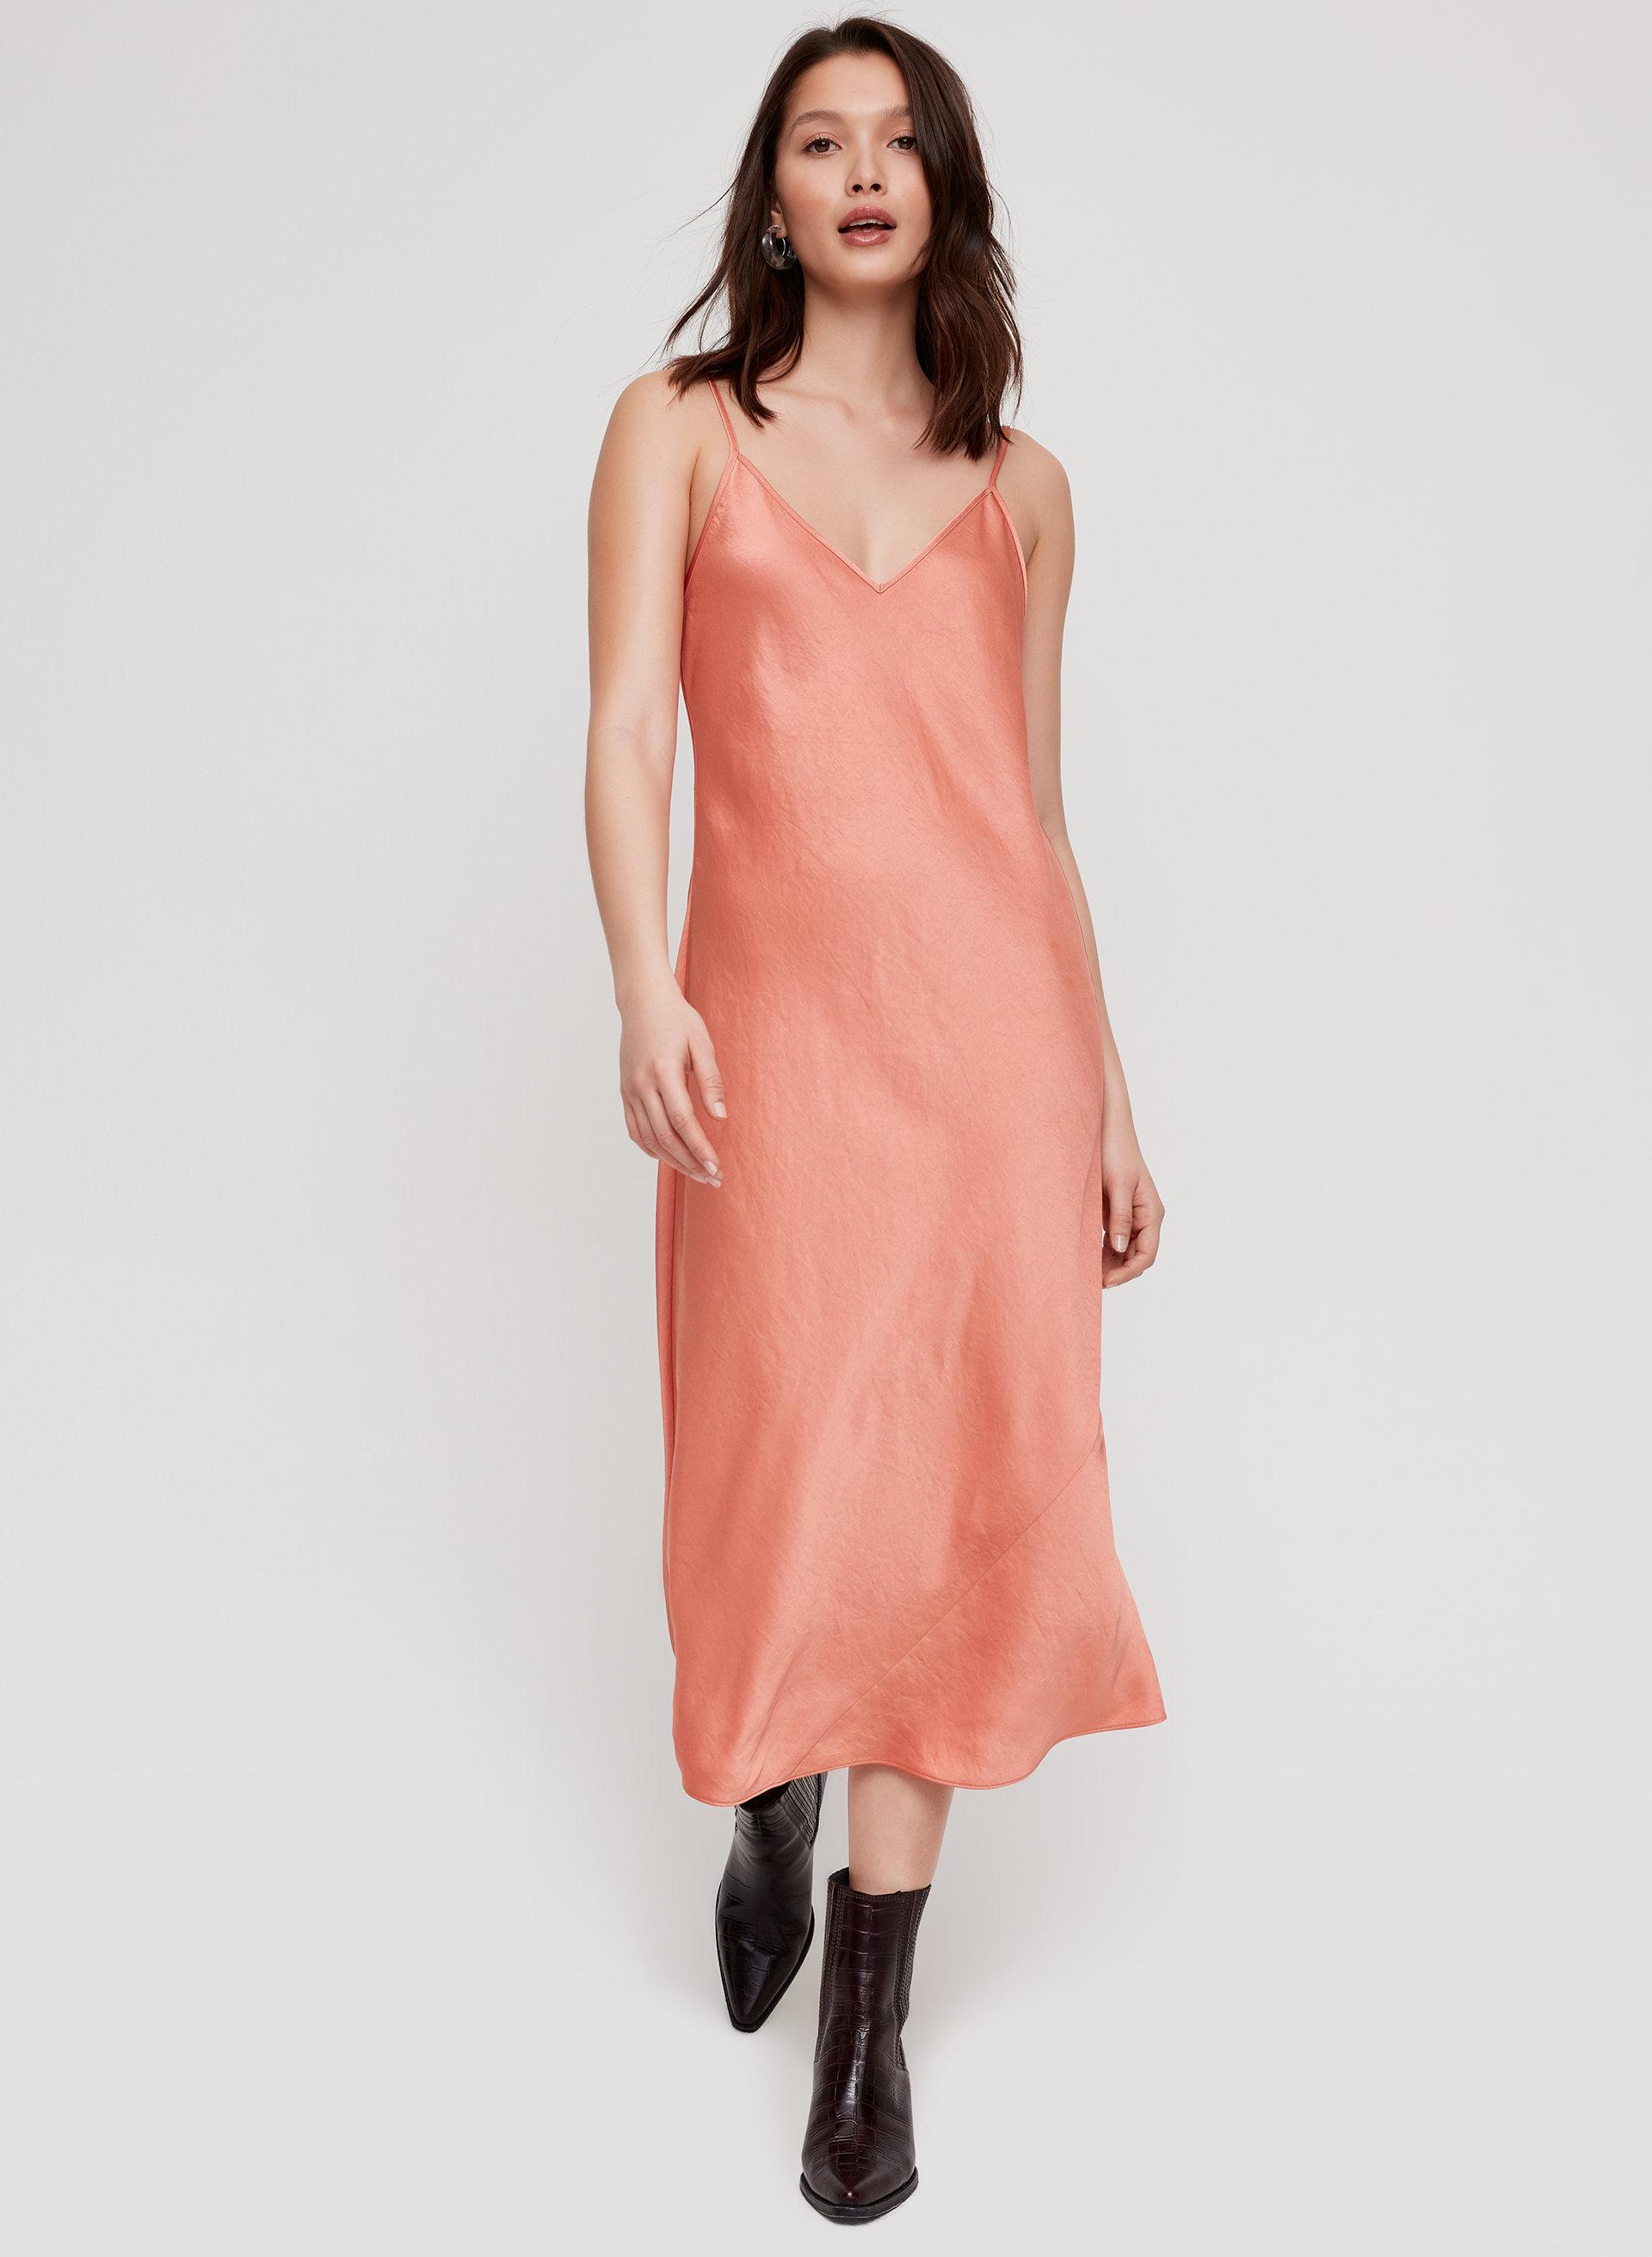 3e23c6b31e788 christine dress Slinky midi slip dress